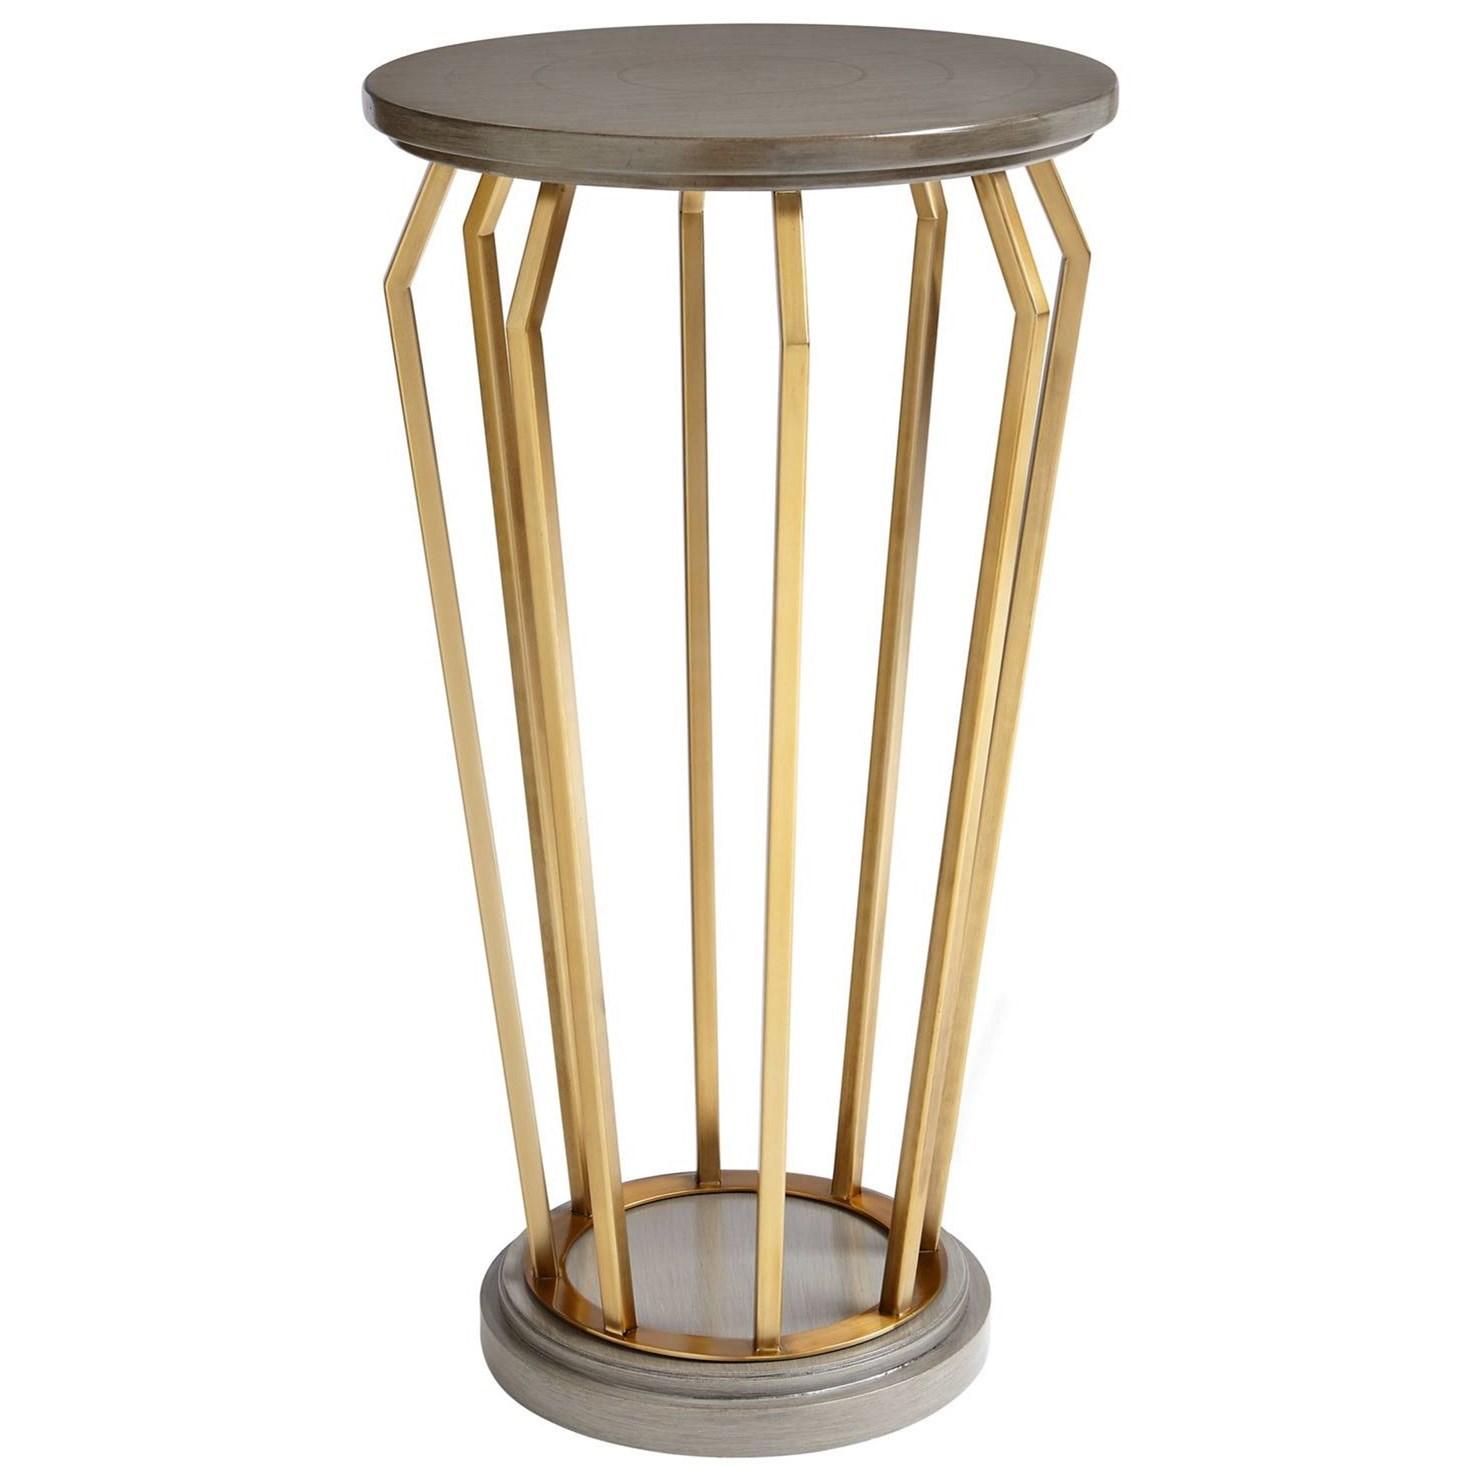 Stanley Furniture Coastal Living Oasis Manzanita Martini Table - Item Number: 527-65-16